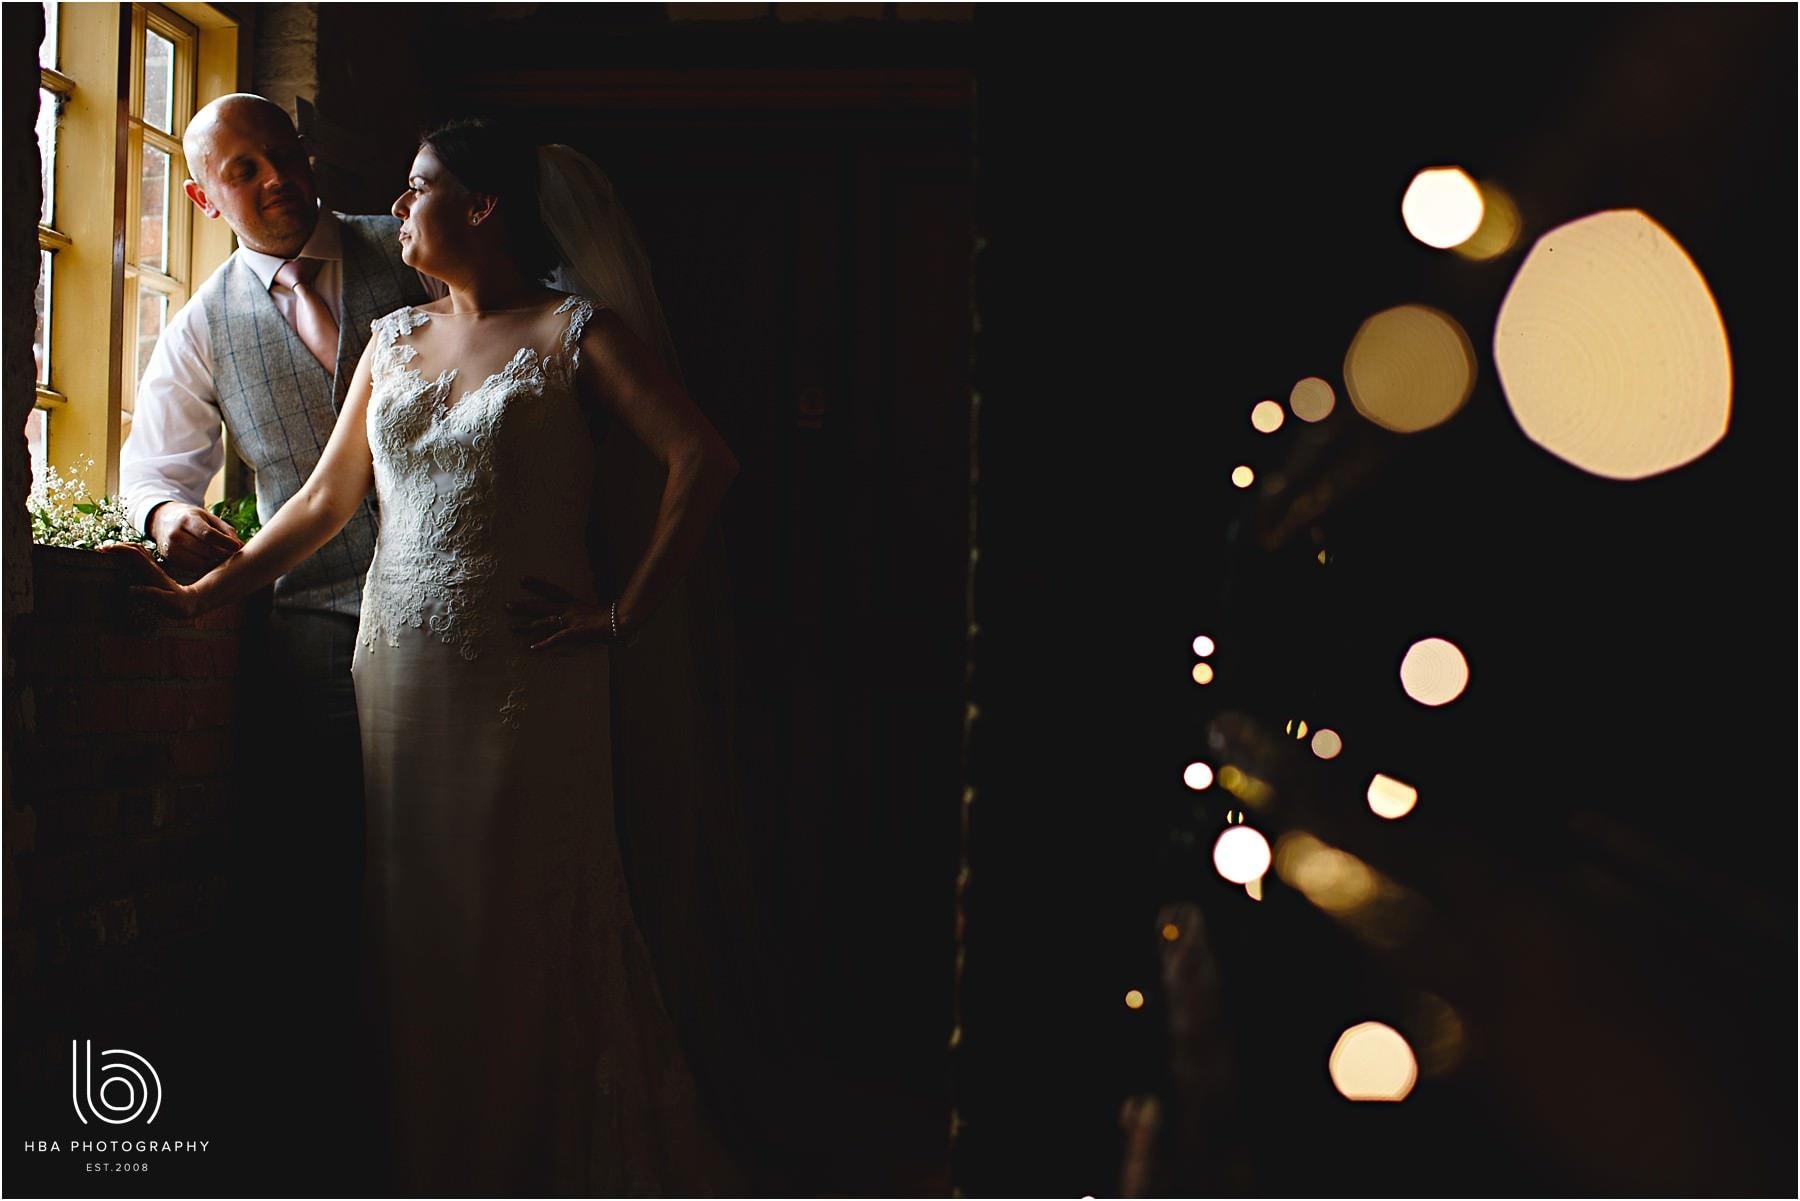 the bride & groom in twinkly lights